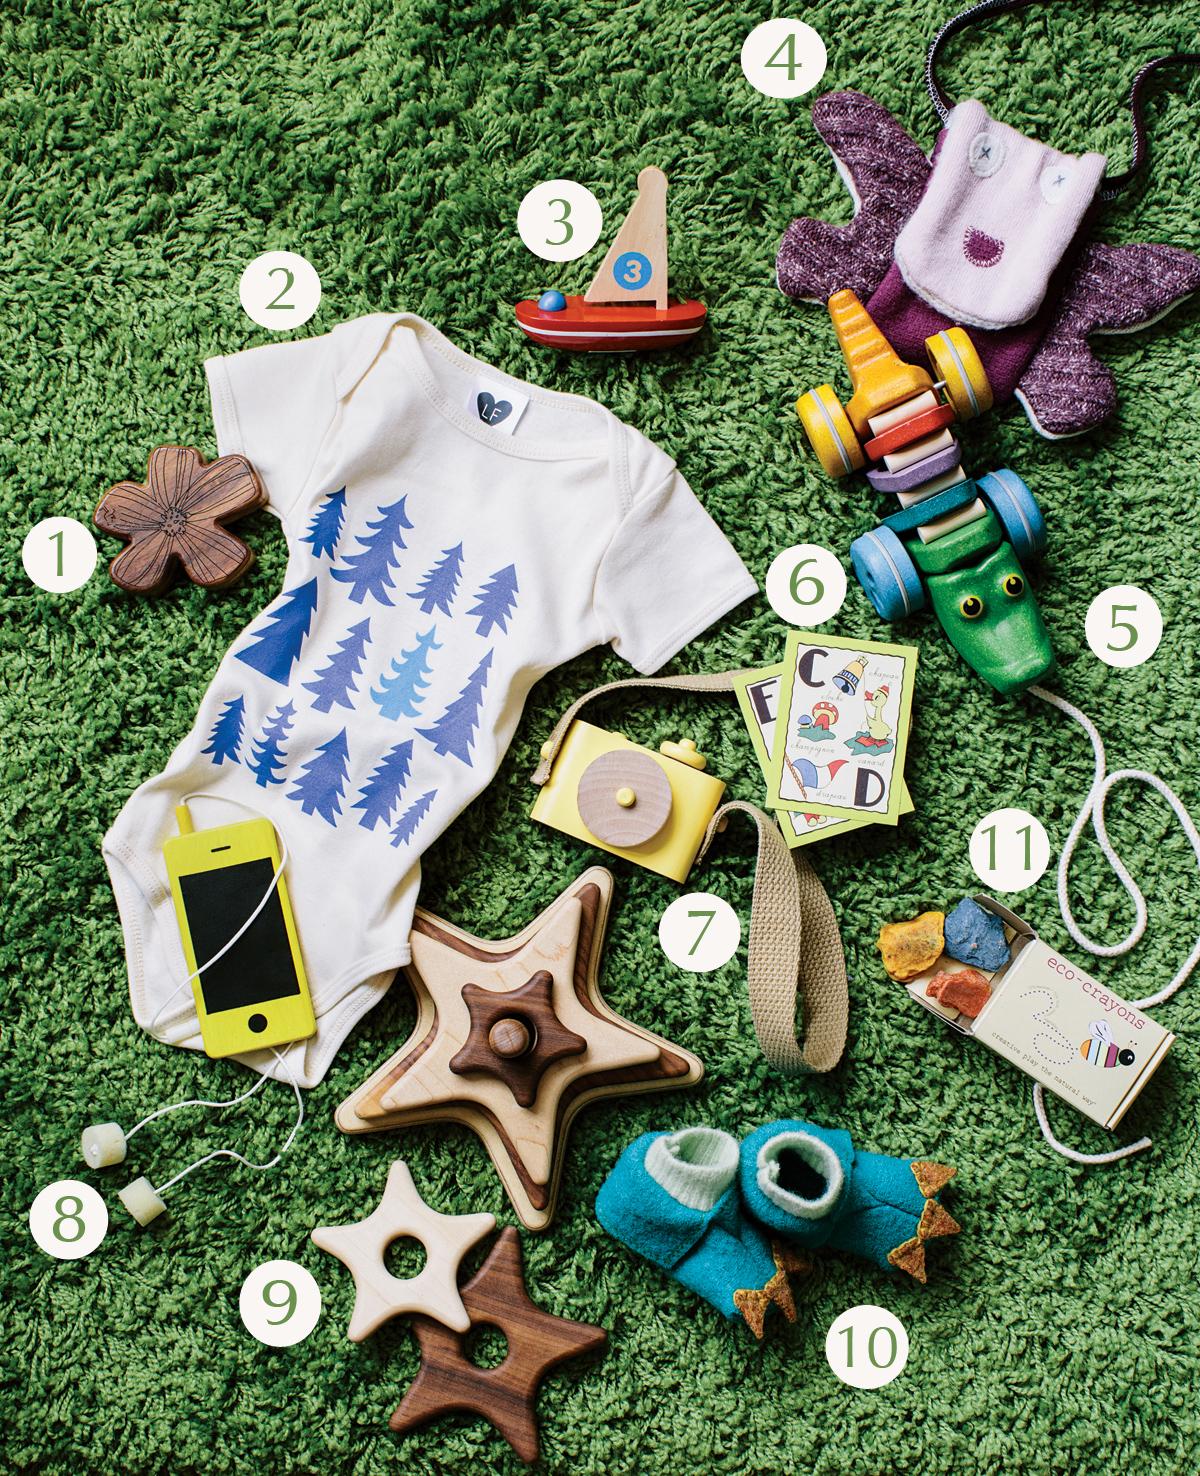 Magpie Kids Toys